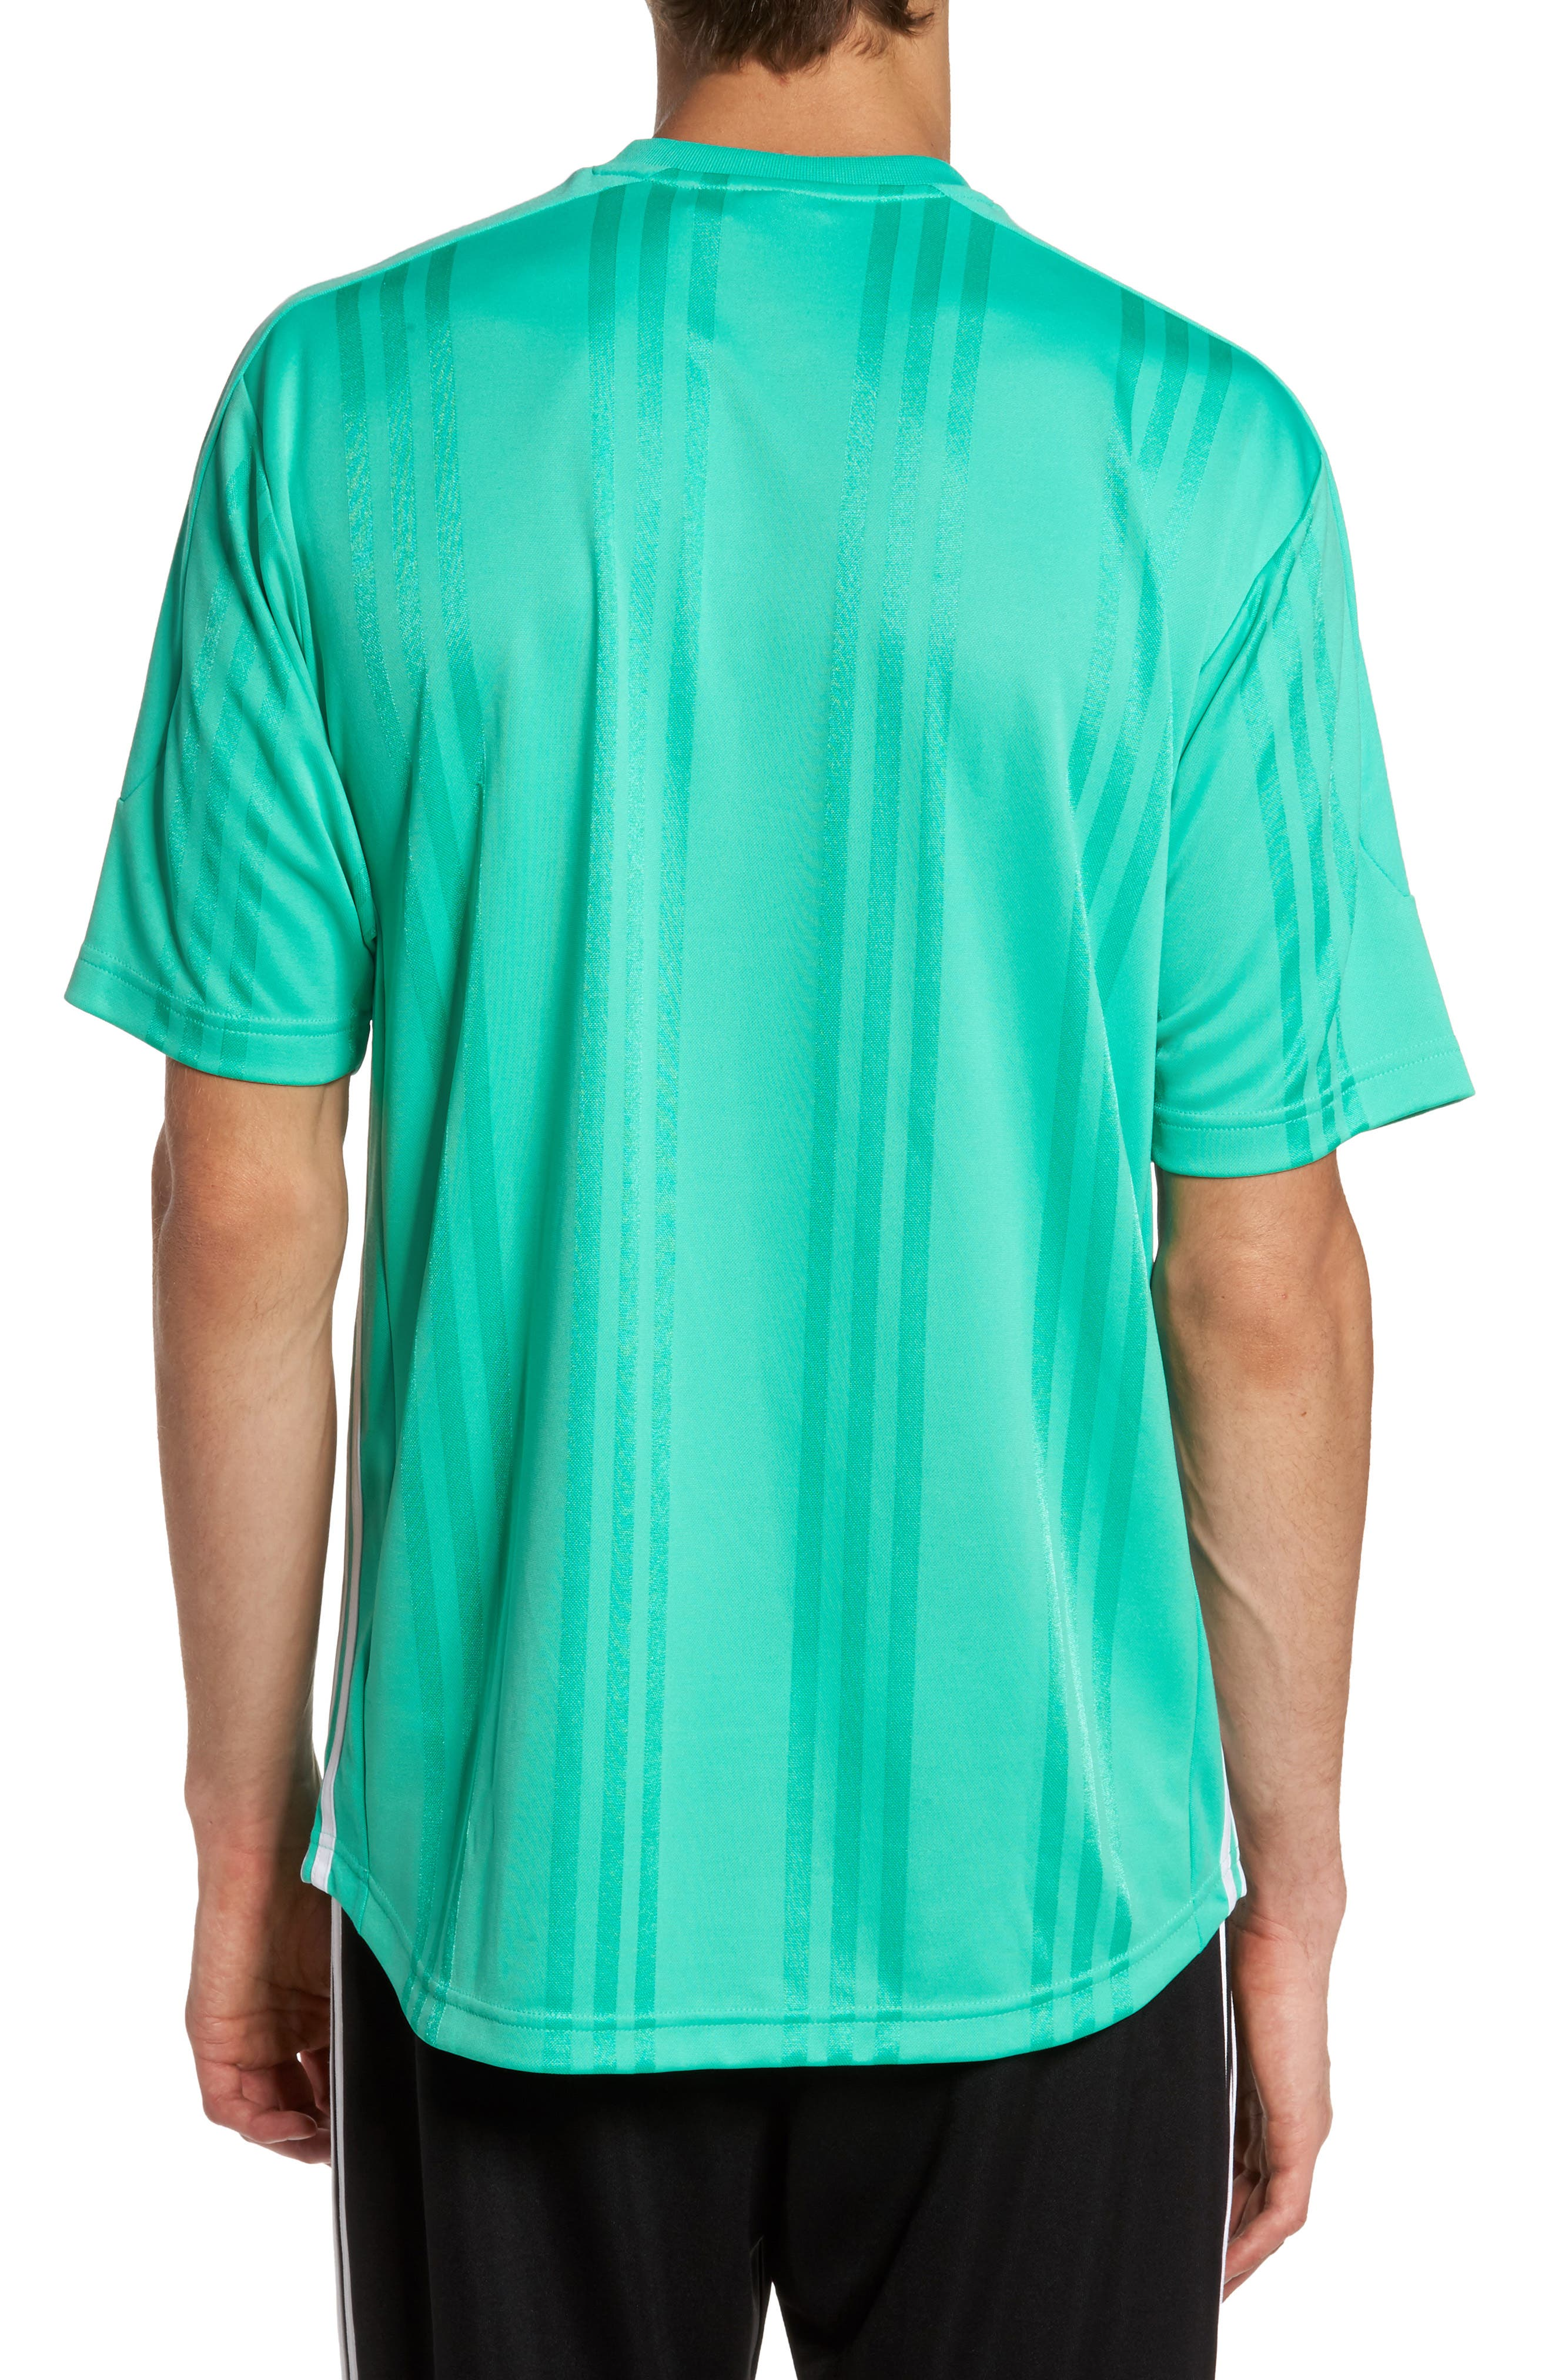 Alternate Image 2  - adidas Originals Jacquard Stripe T-Shirt